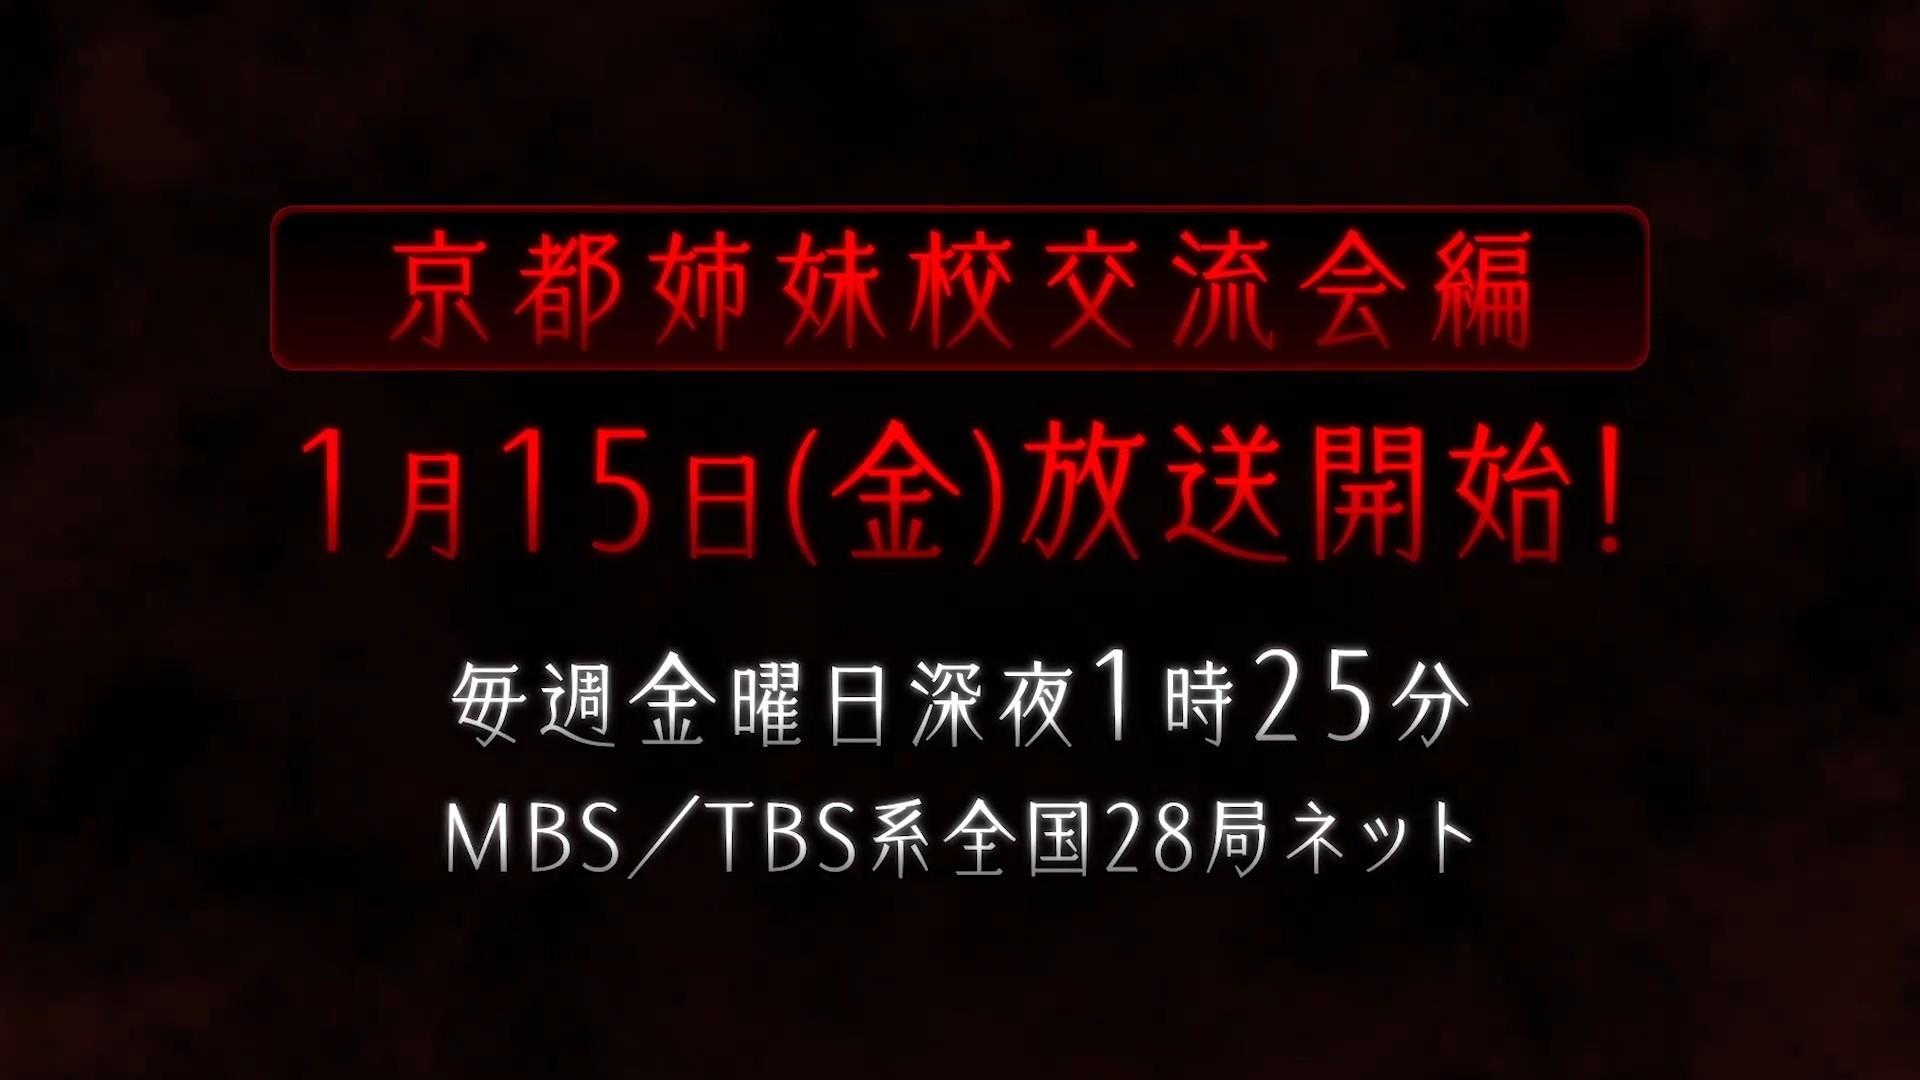 TV动画「咒术回战」第4弹PV公开, 第14话将于1月15日播出